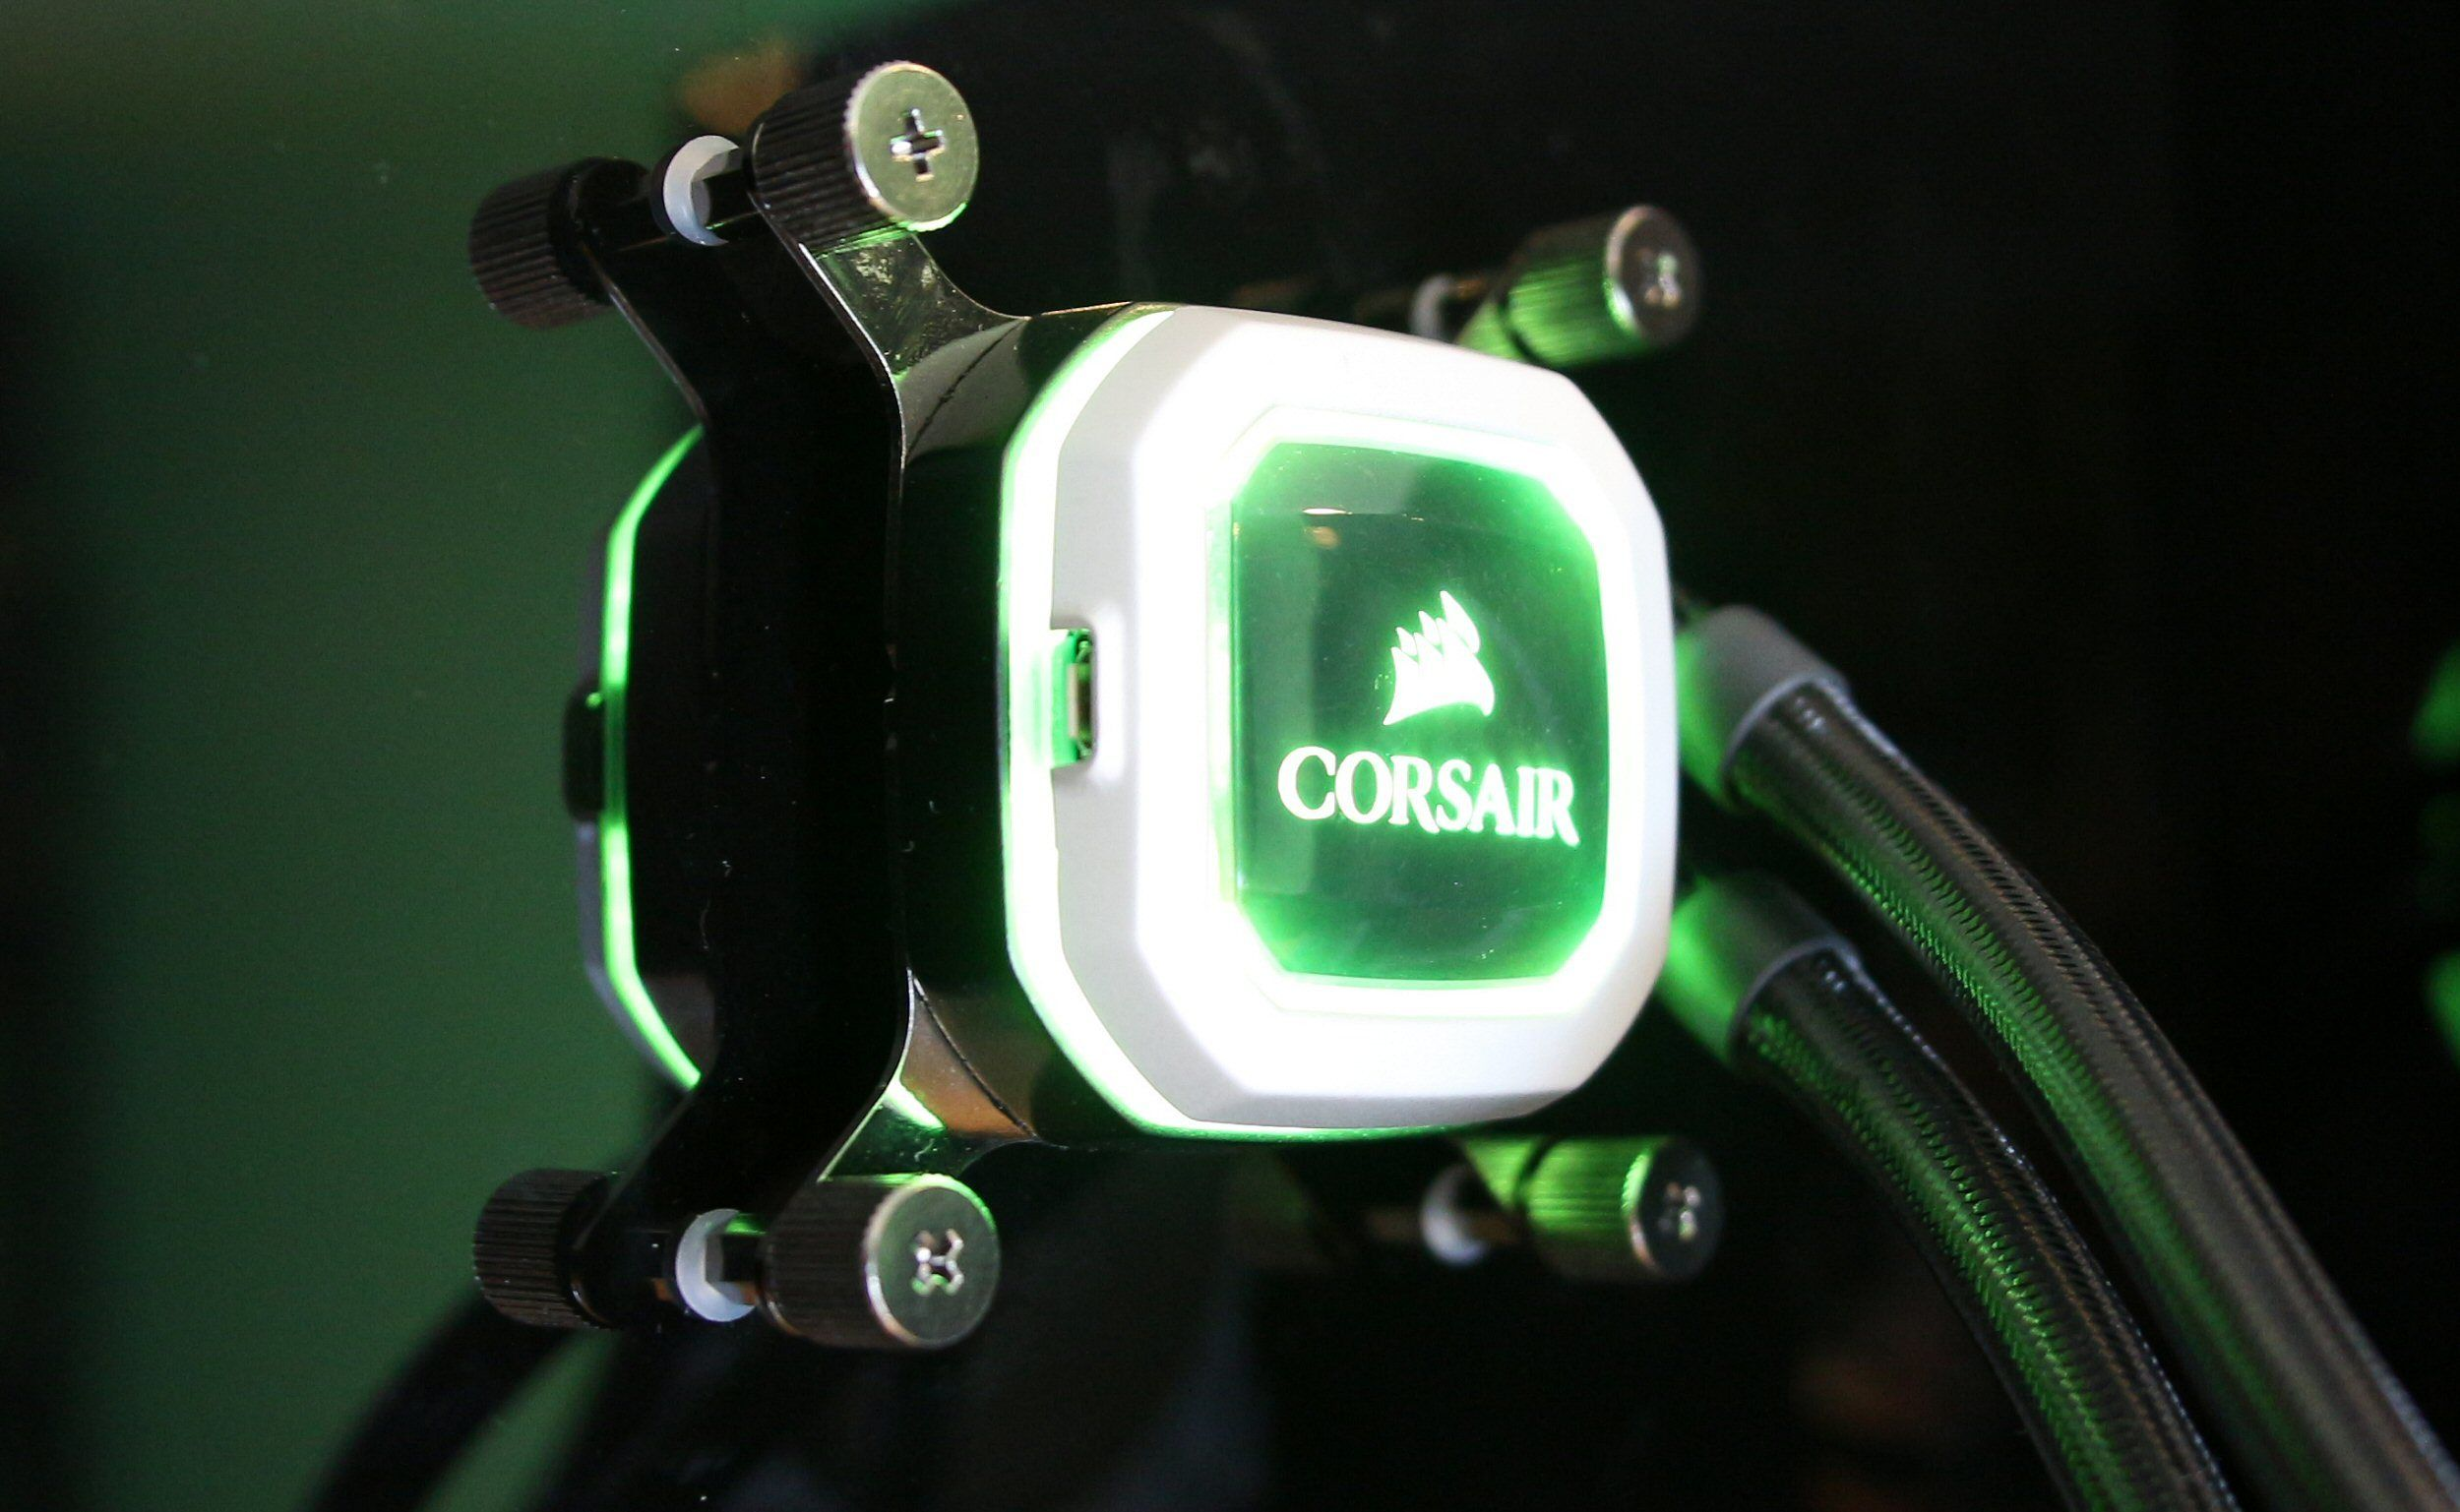 Nye Hydro-utgaver får RGB-lys med styring via mikro-USB.